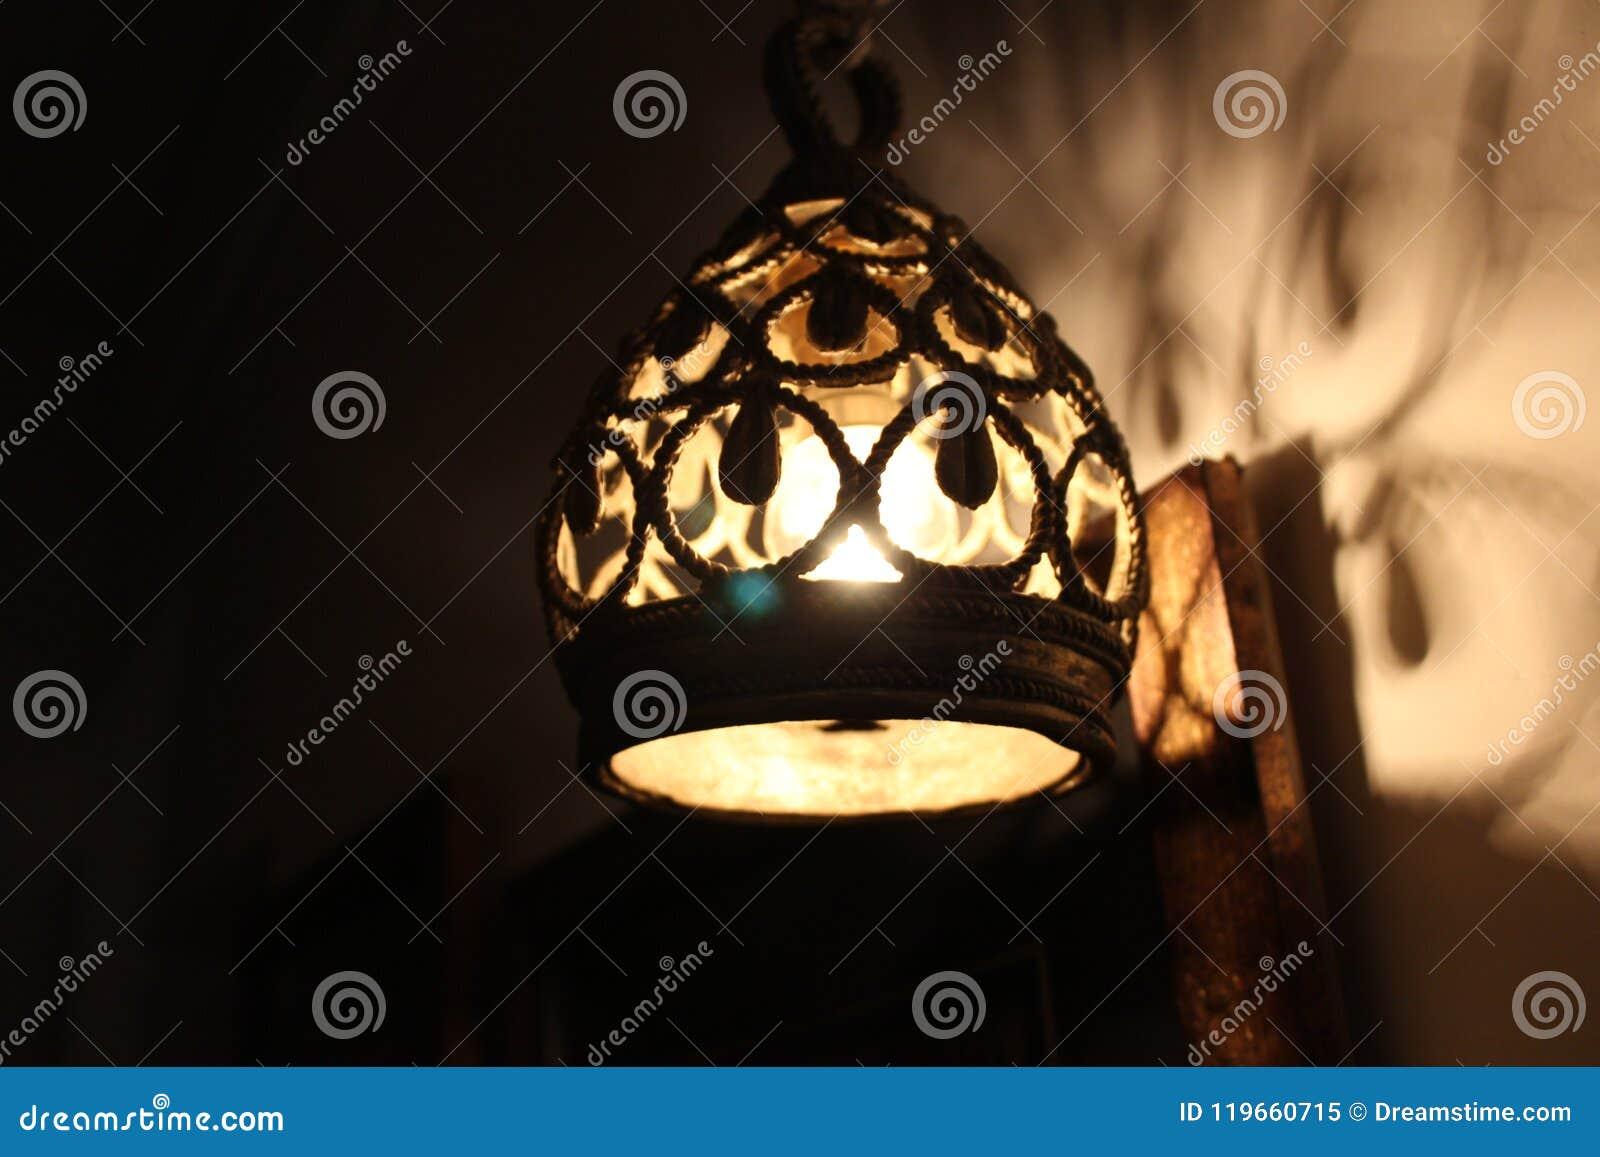 Lamp shade in diwali stock image image of light celebration download lamp shade in diwali stock image image of light celebration 119660715 aloadofball Images